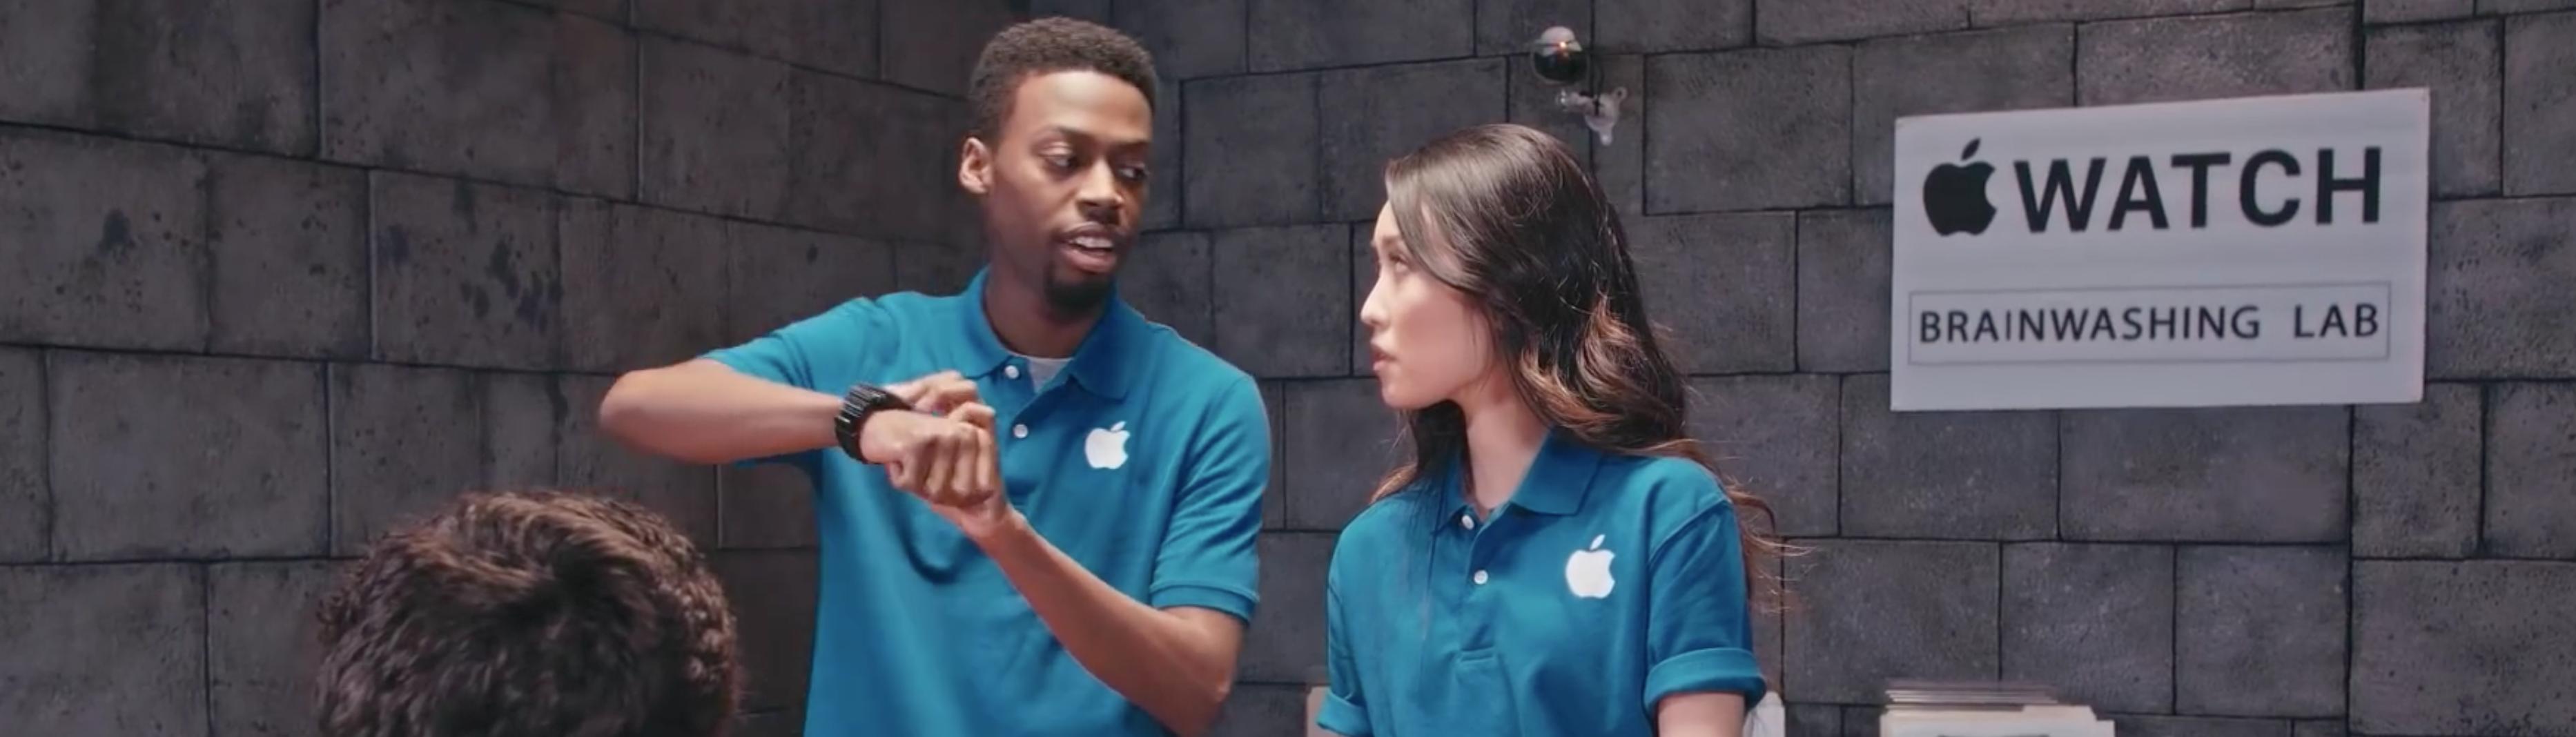 Apple Watch - Brainwashing Lab